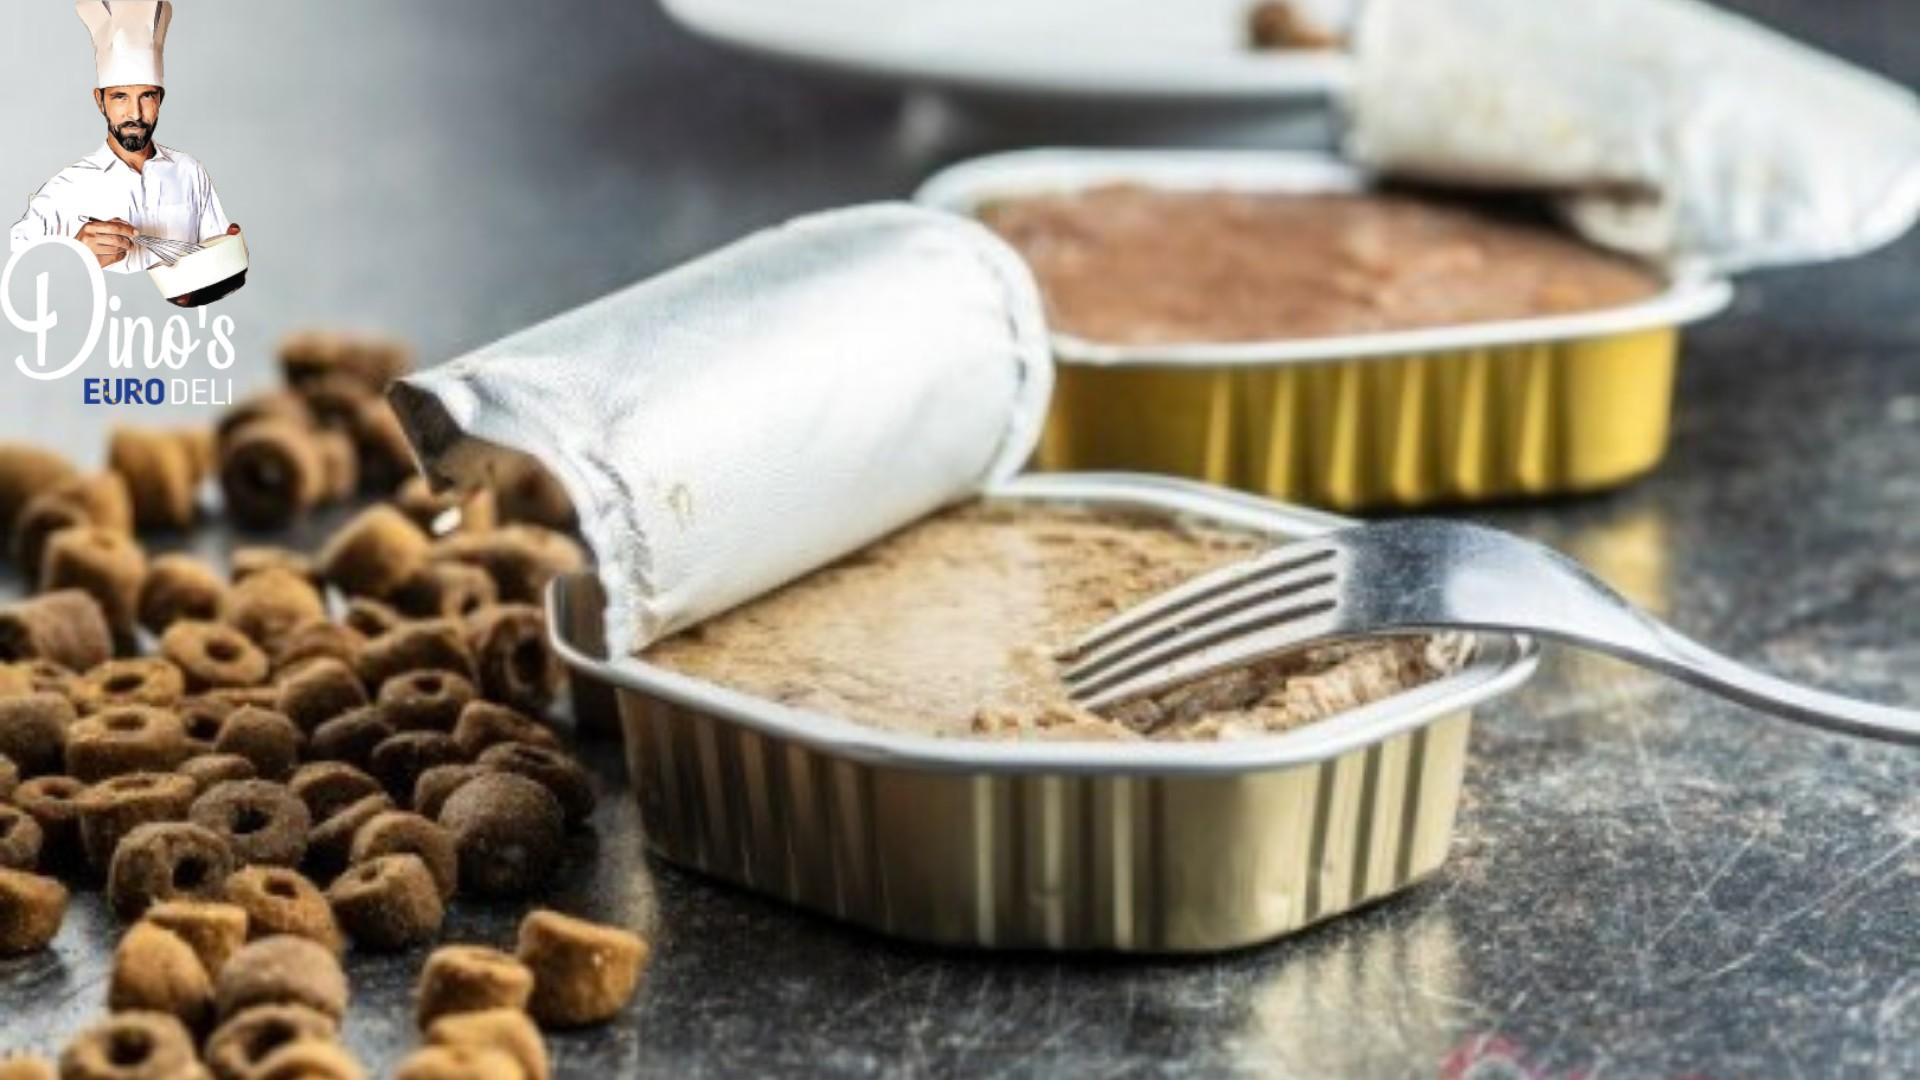 Dinos Euro Deli Gourmet Foods Online